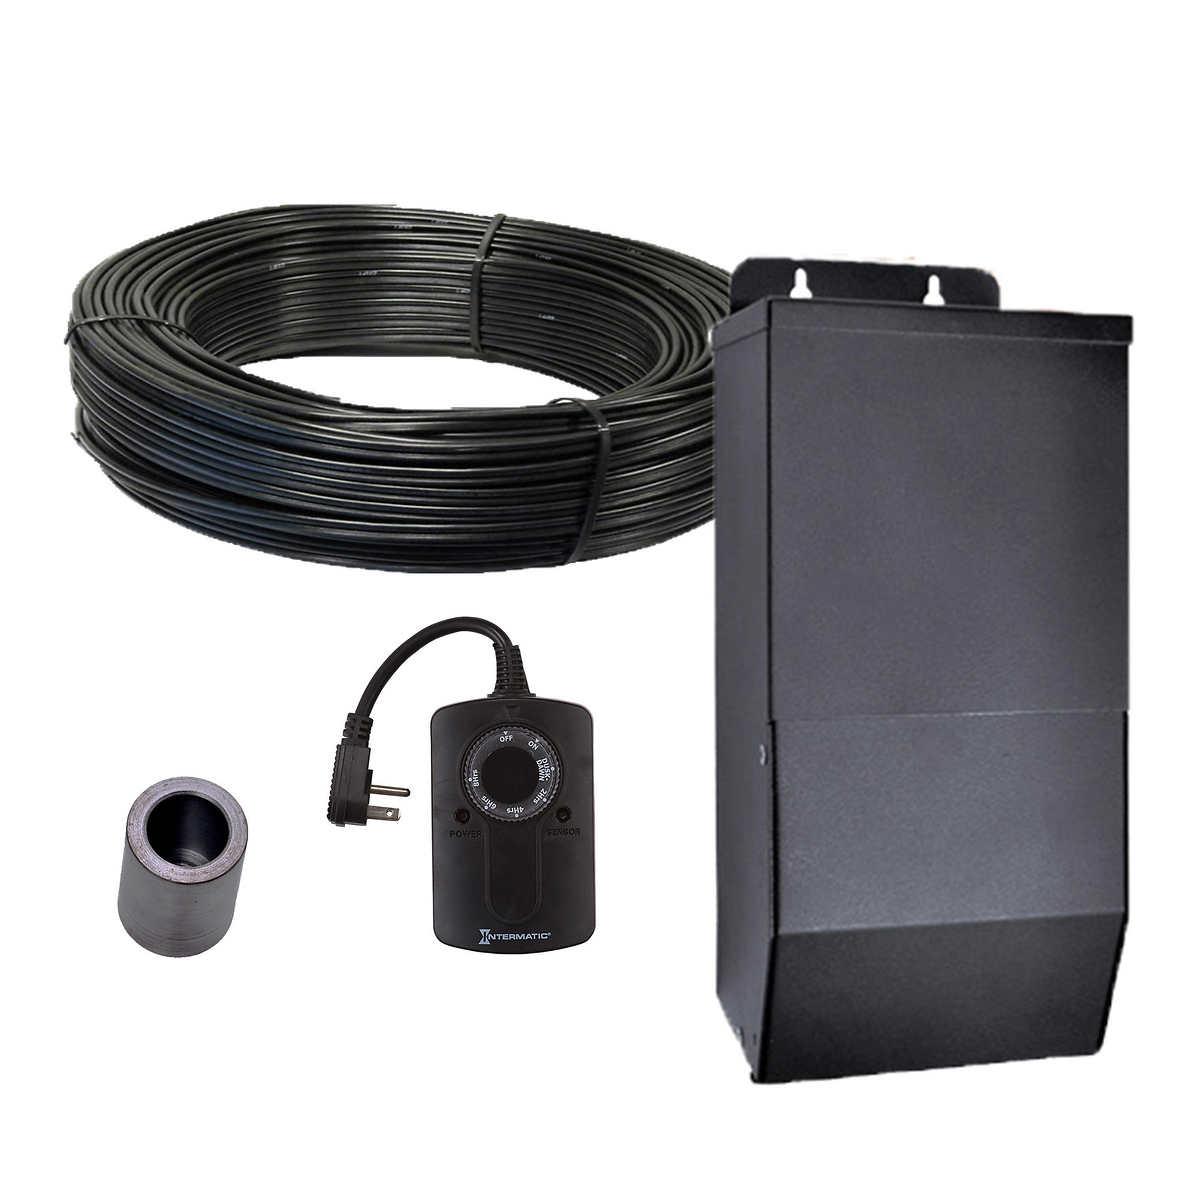 Solar patio lights costco - Professional Series 100 Watt Landscape Lighting Power And Accessory Kit